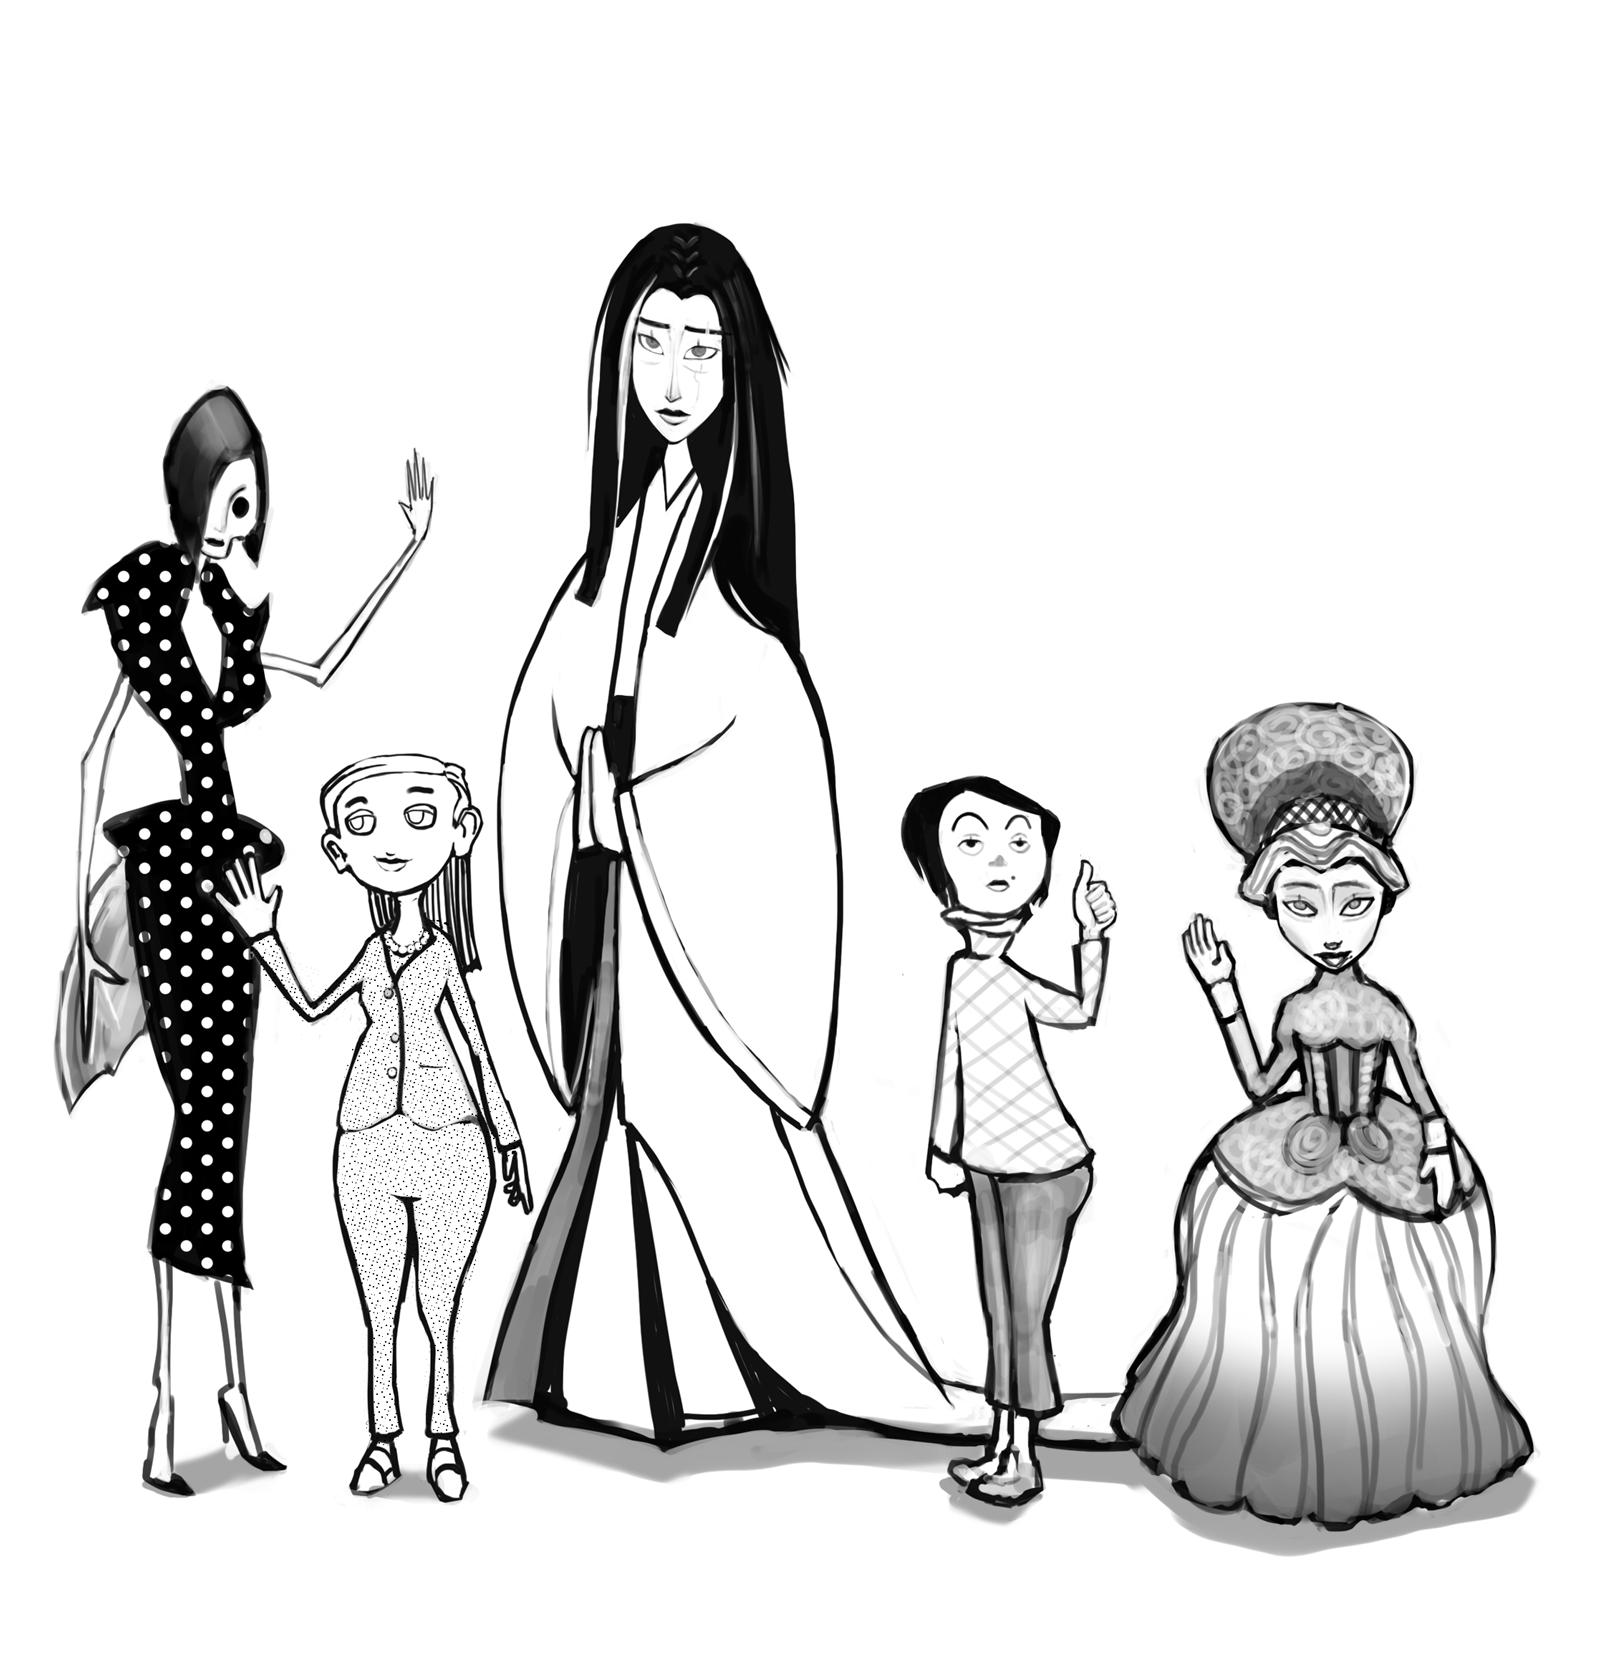 LAIKA_Sketch_MothersDay_v2a_kb.png